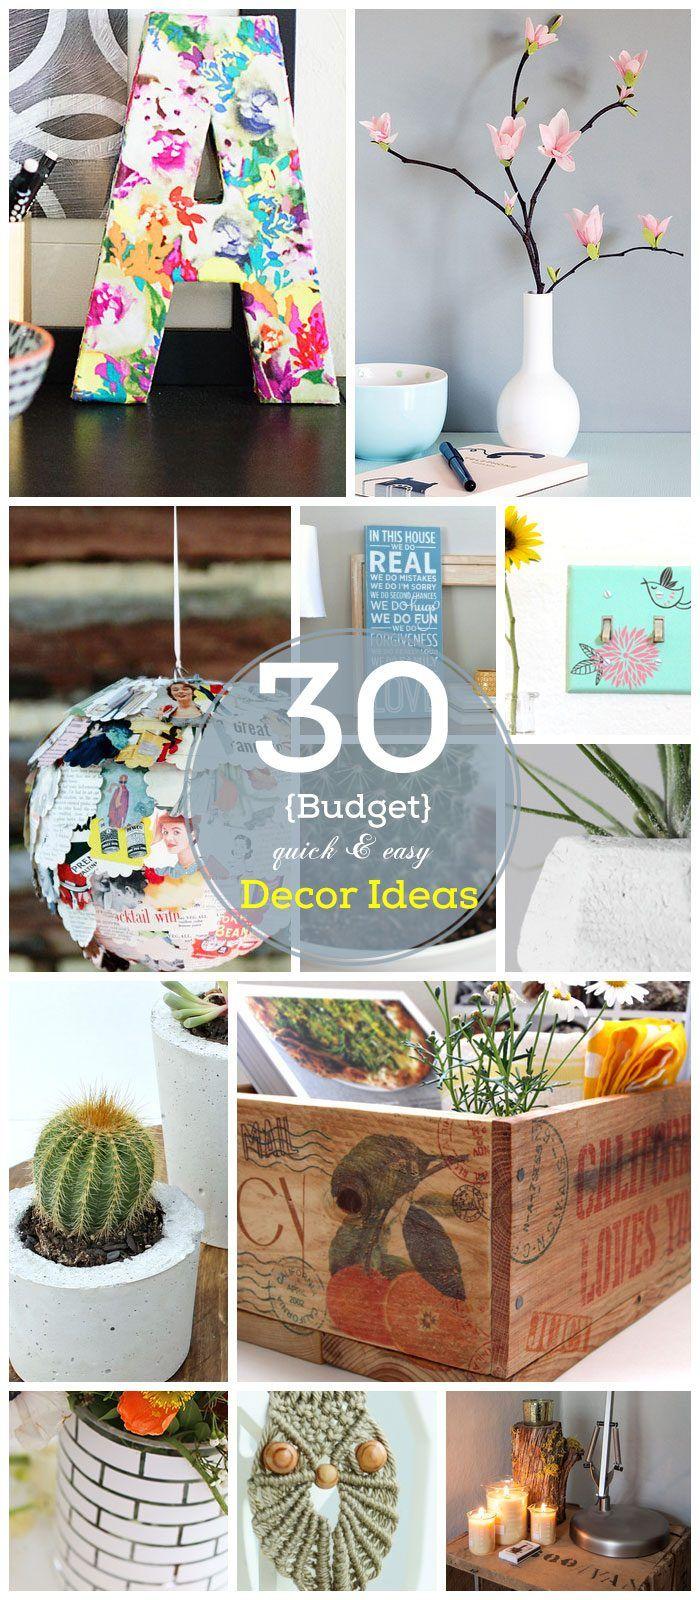 30 DIY Home Decor Ideas on a Budget | Click for Full Tutorials | Easy and Creative Decor Ideas & 50+ Super Easy Affordable DIY Home Decor Ideas and Projects ...